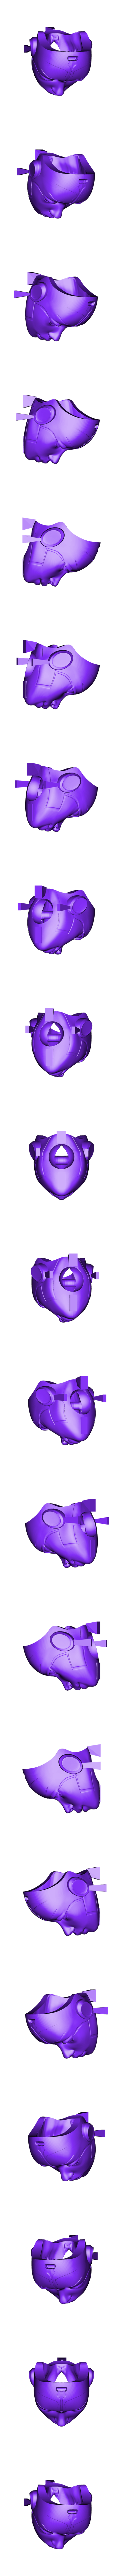 head_rectificada_.stl Download free STL file Robot woman - Robotica • Model to 3D print, Shira